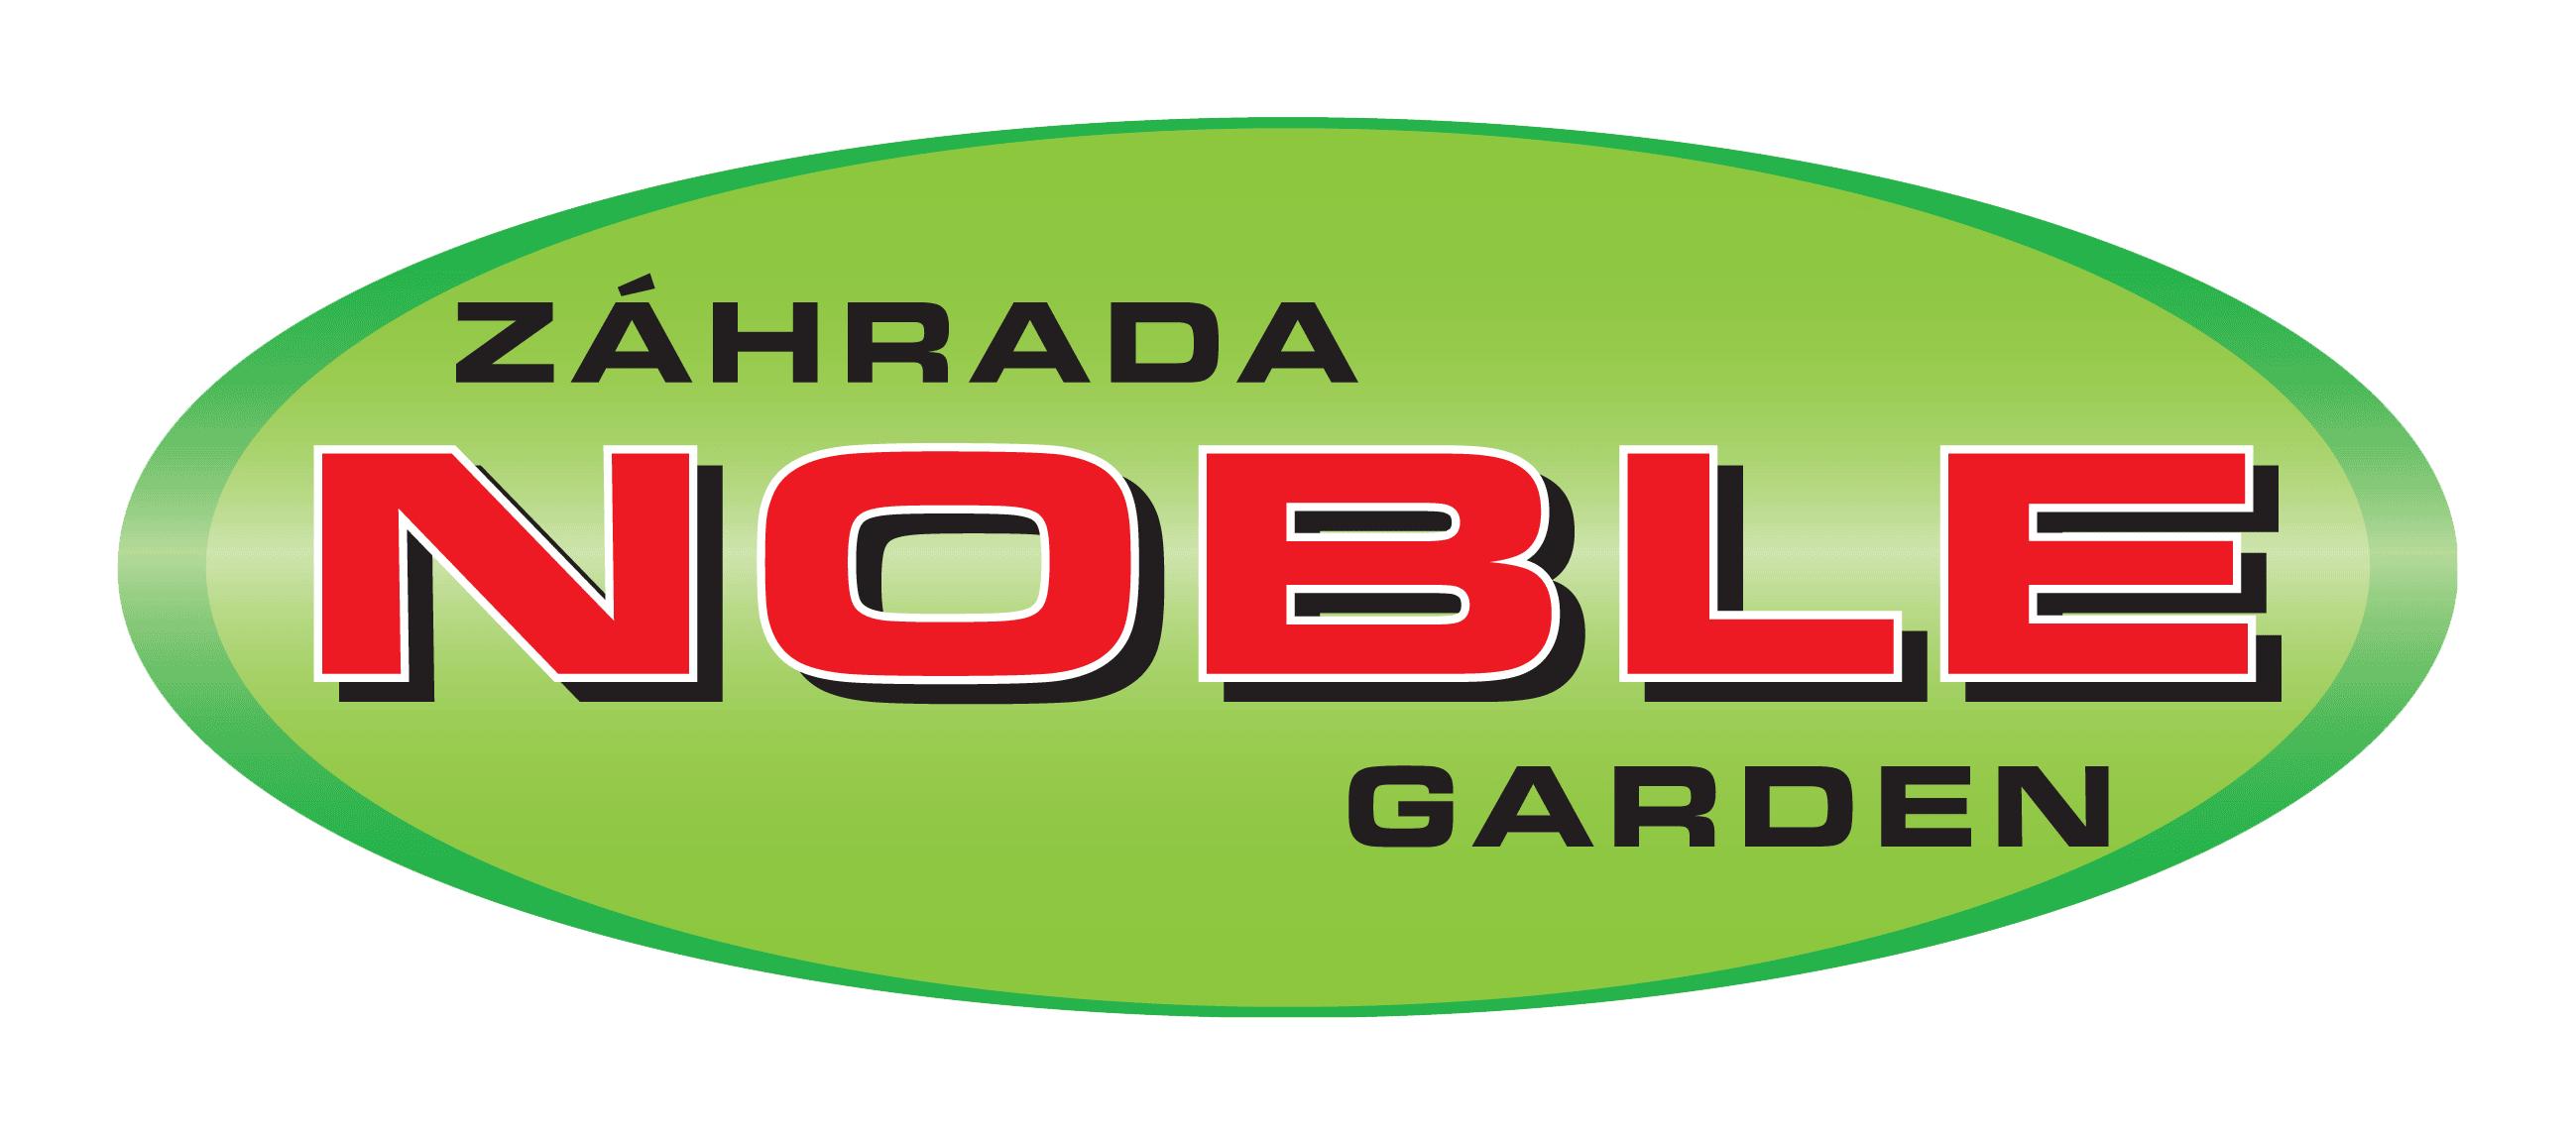 sportfitt-partneri-nogle-garden-logo